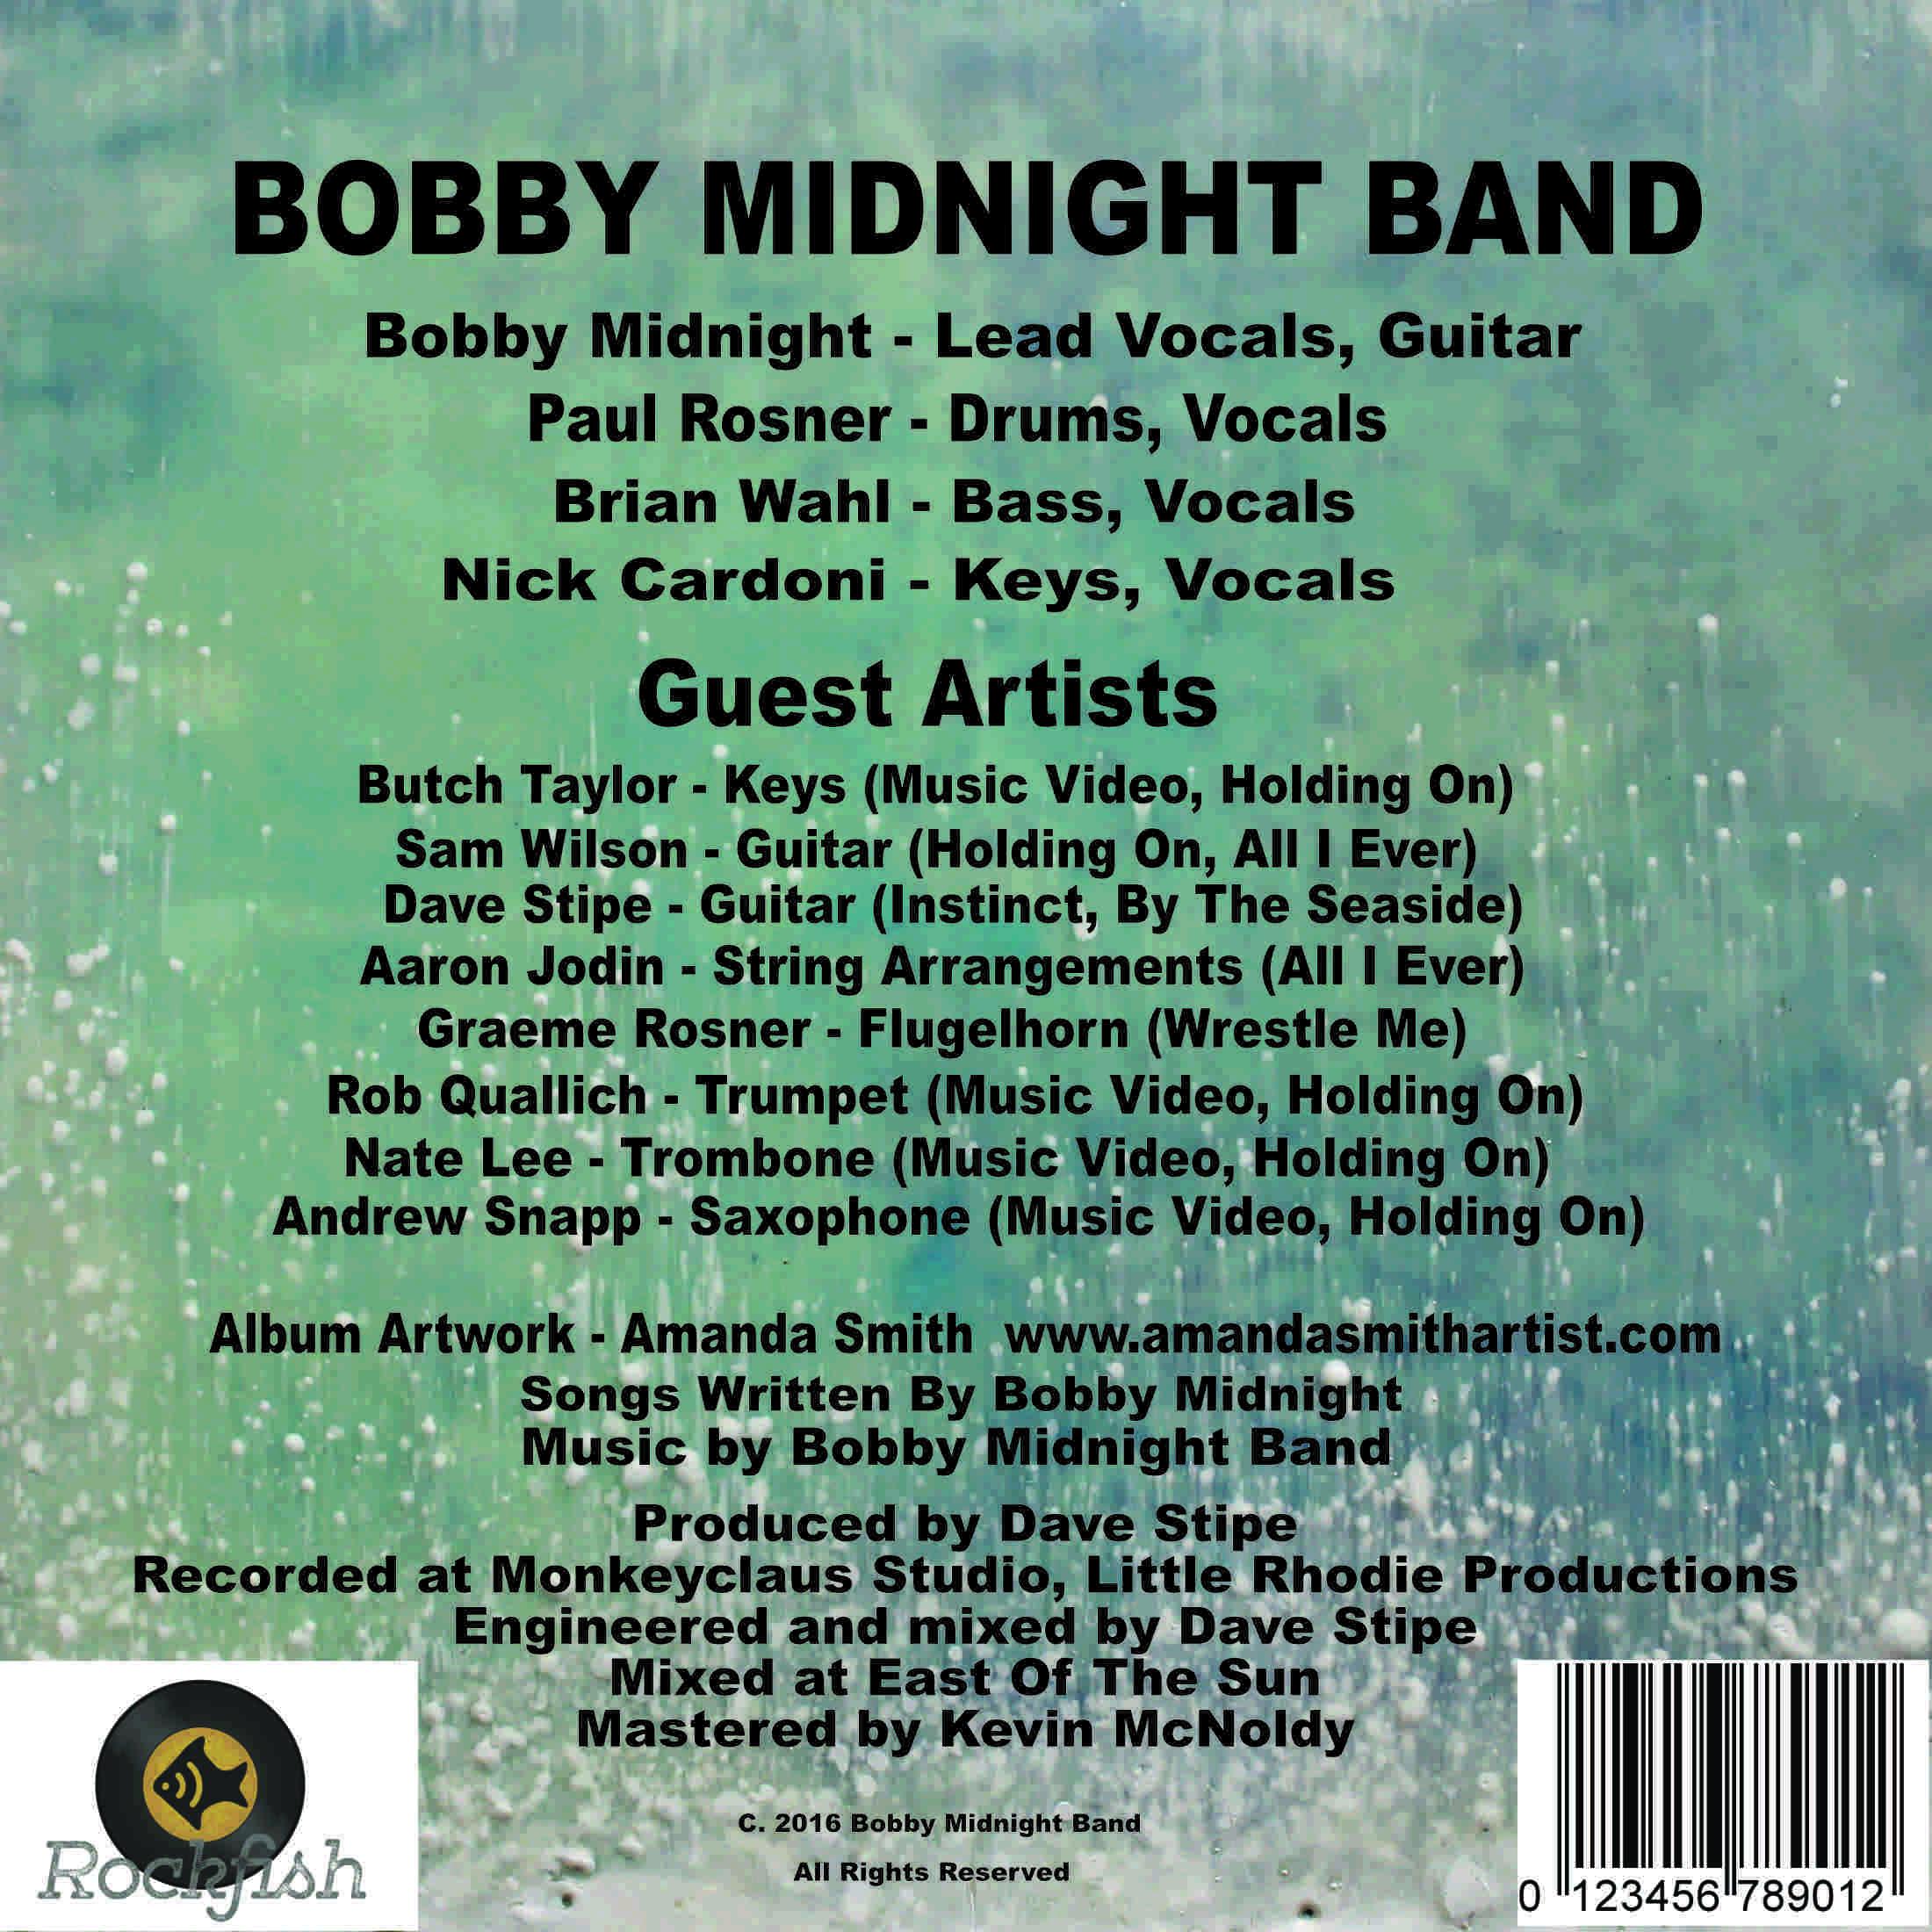 Bobby Midnight Band - All I Ever (Album Notes).jpg